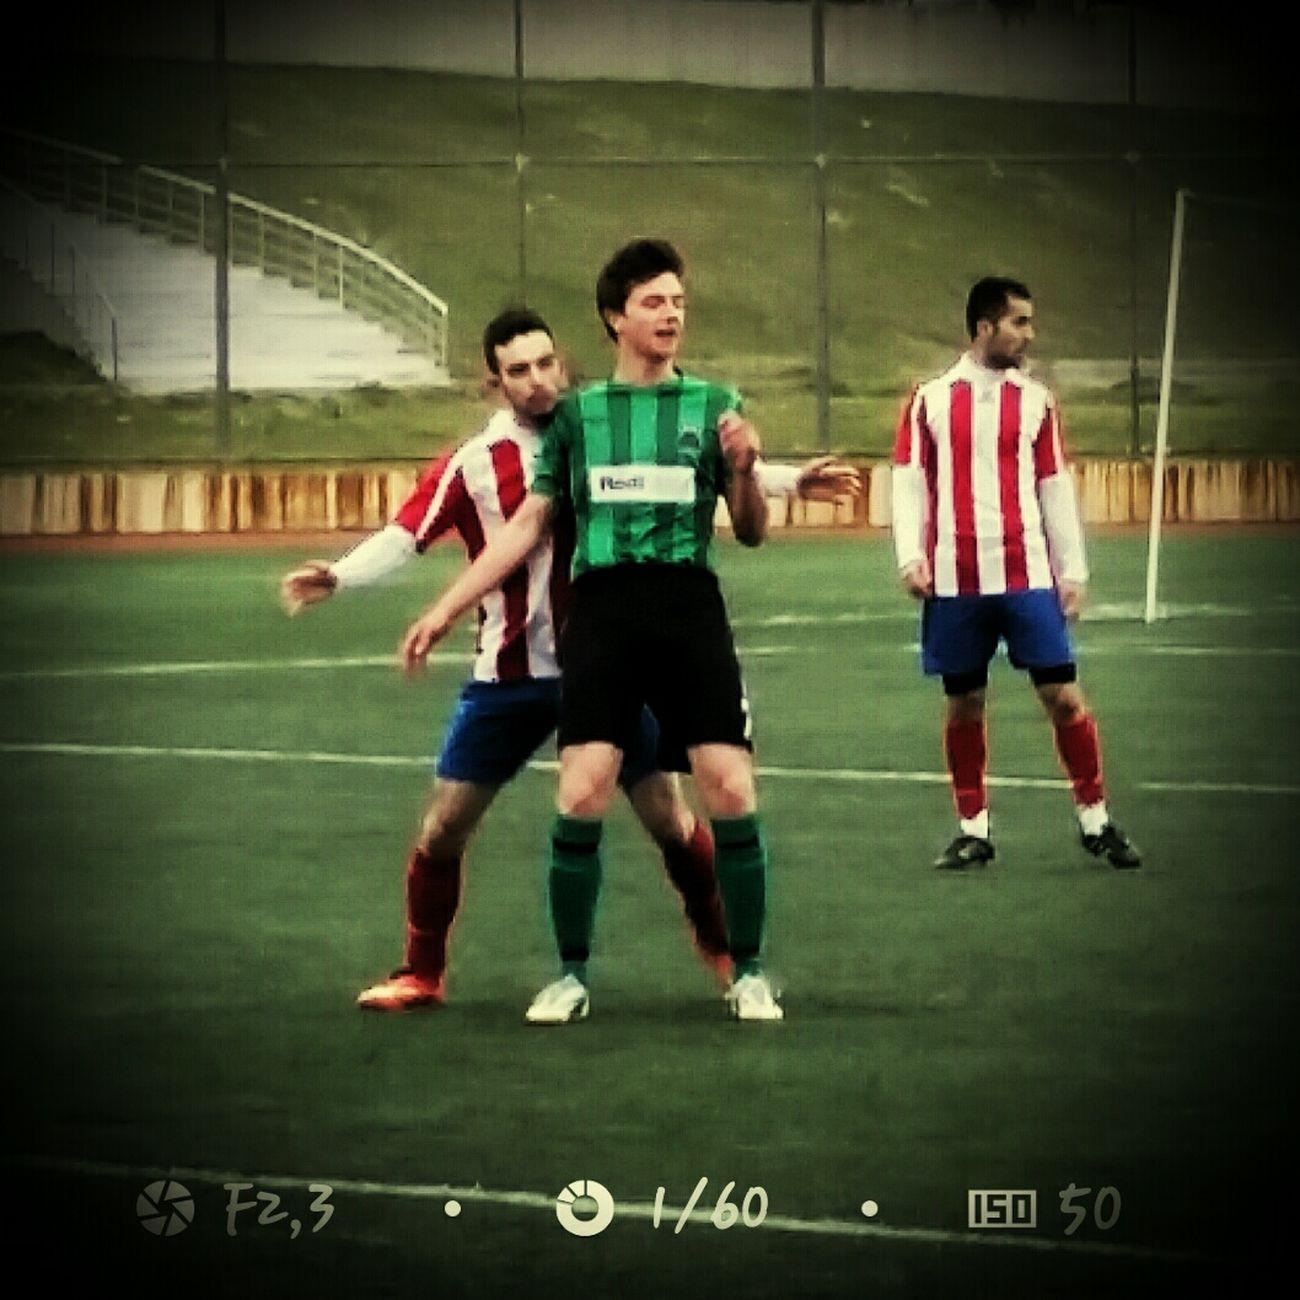 Football La Defans Savunma Champions County Chapionship That's Me Relaxing Enjoying Life Taking Photos Hello World